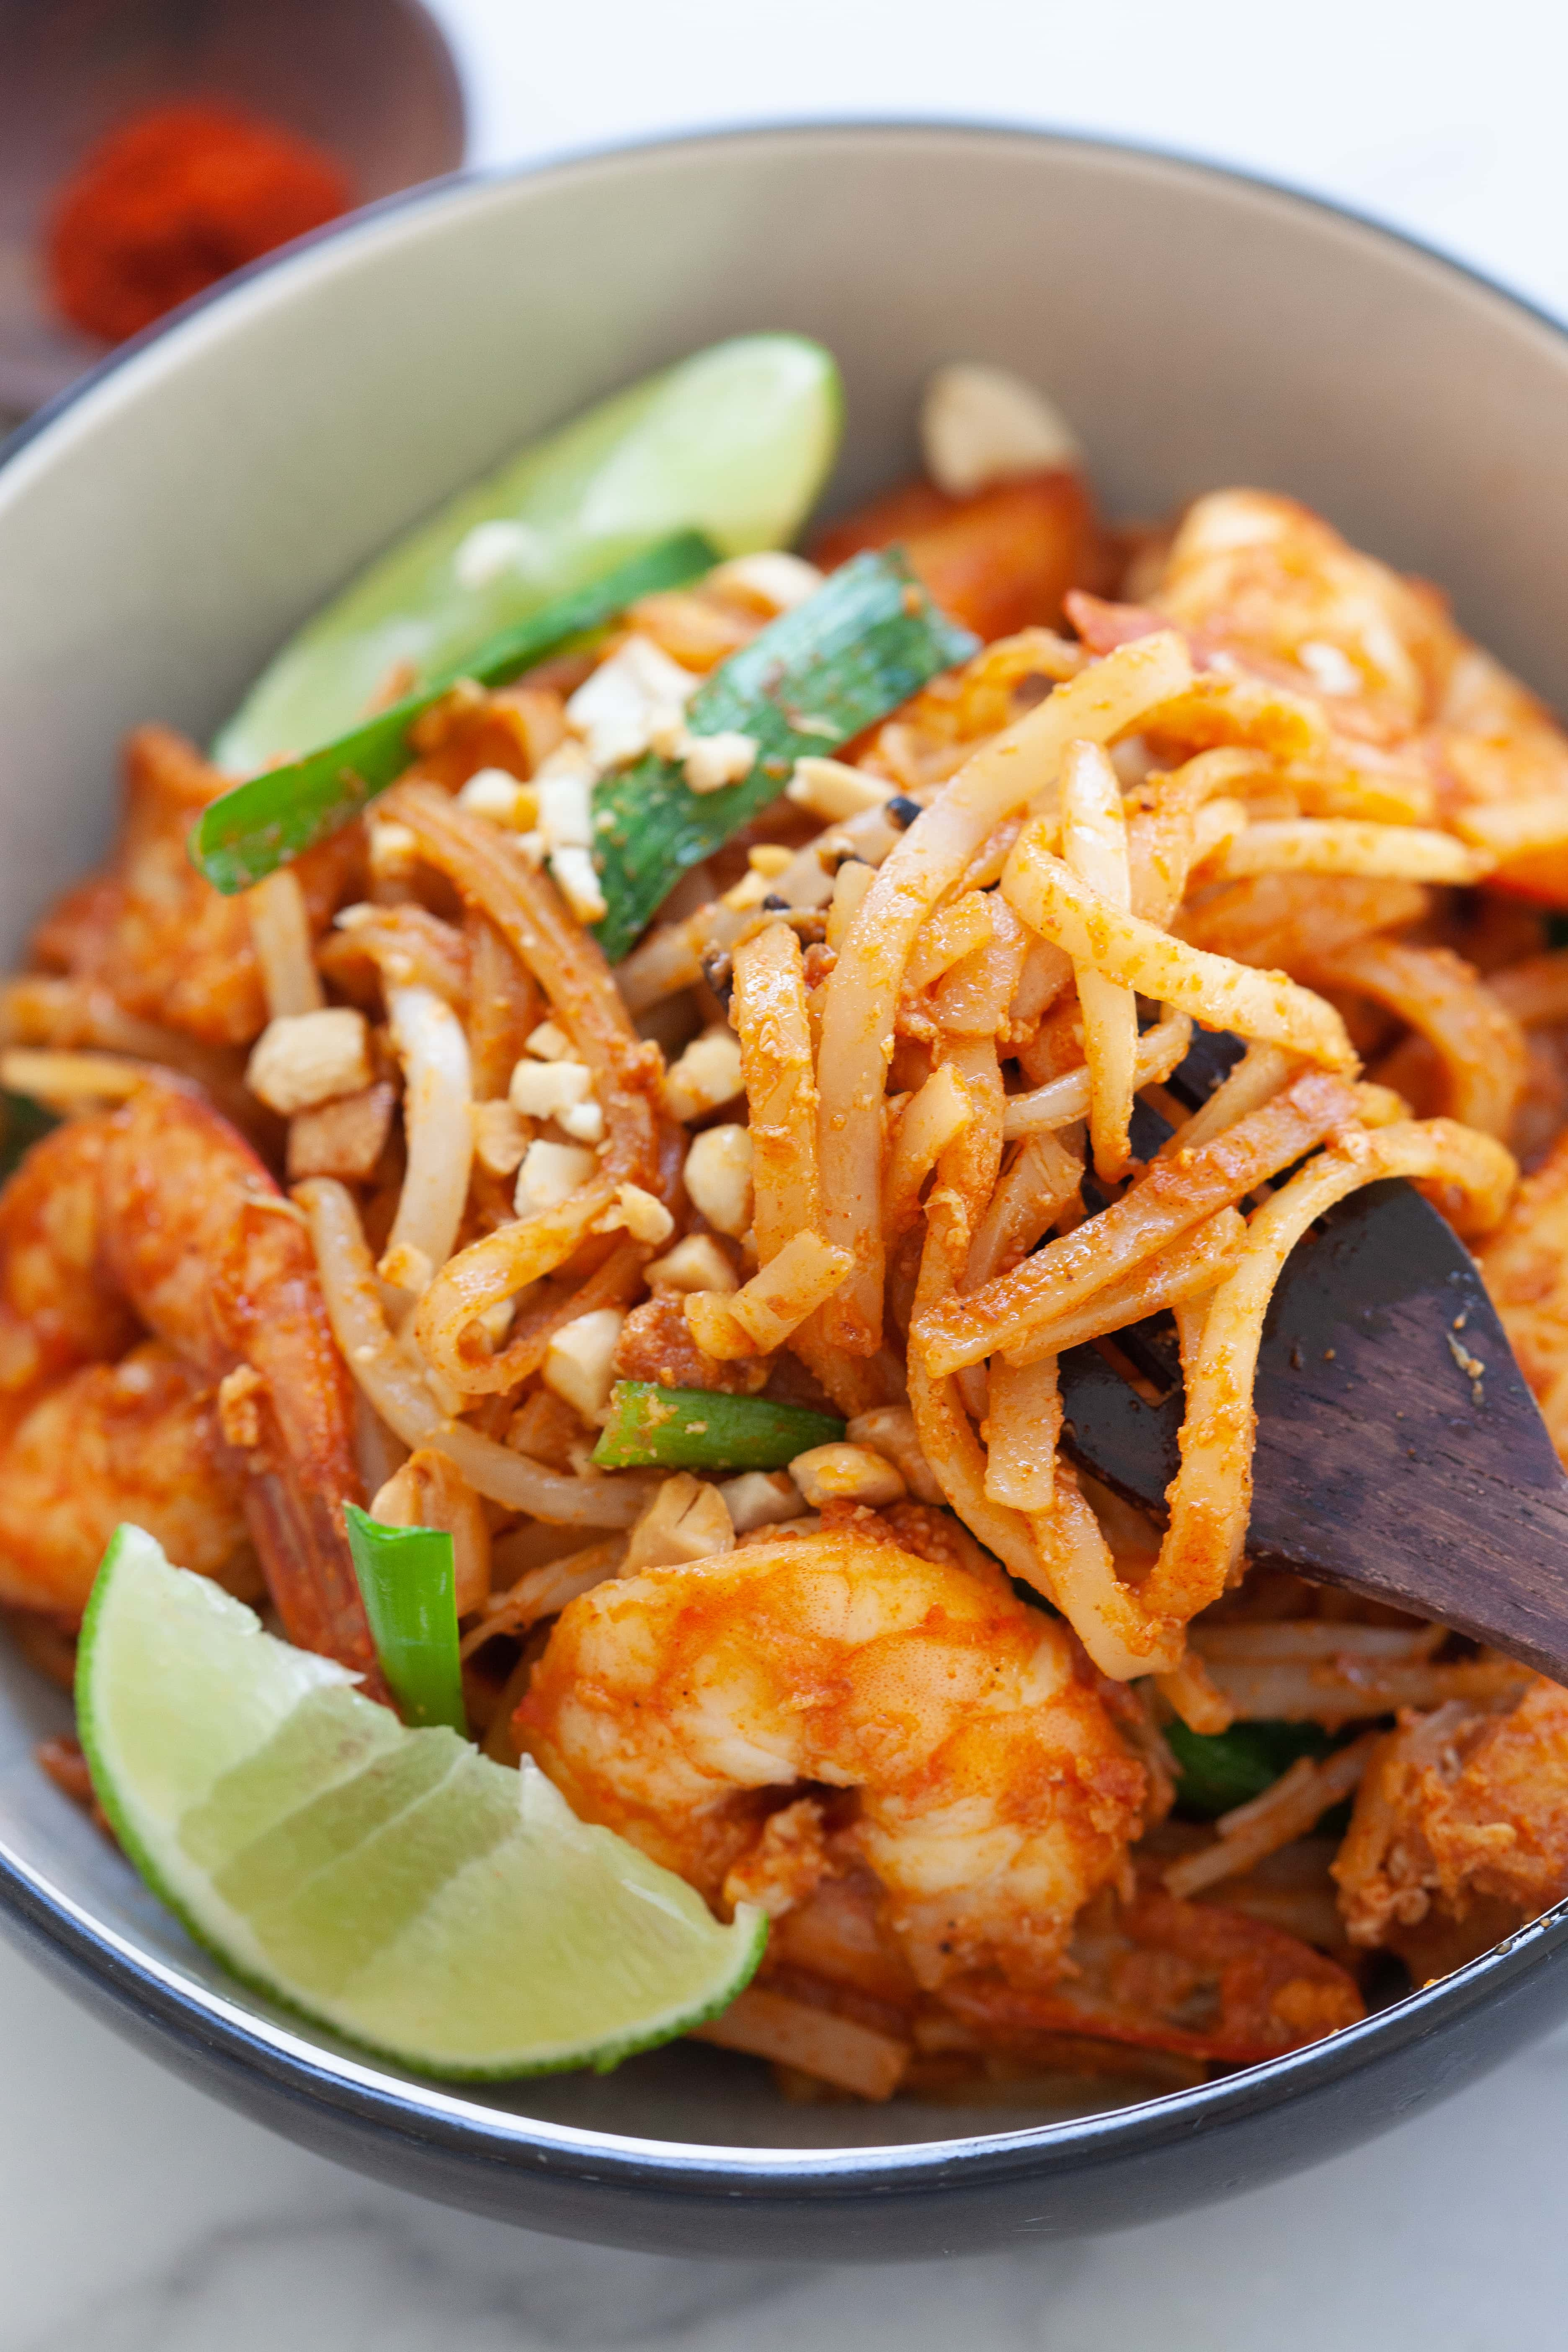 Pad Thai recipe with rice sticks, shrimp and tofu.